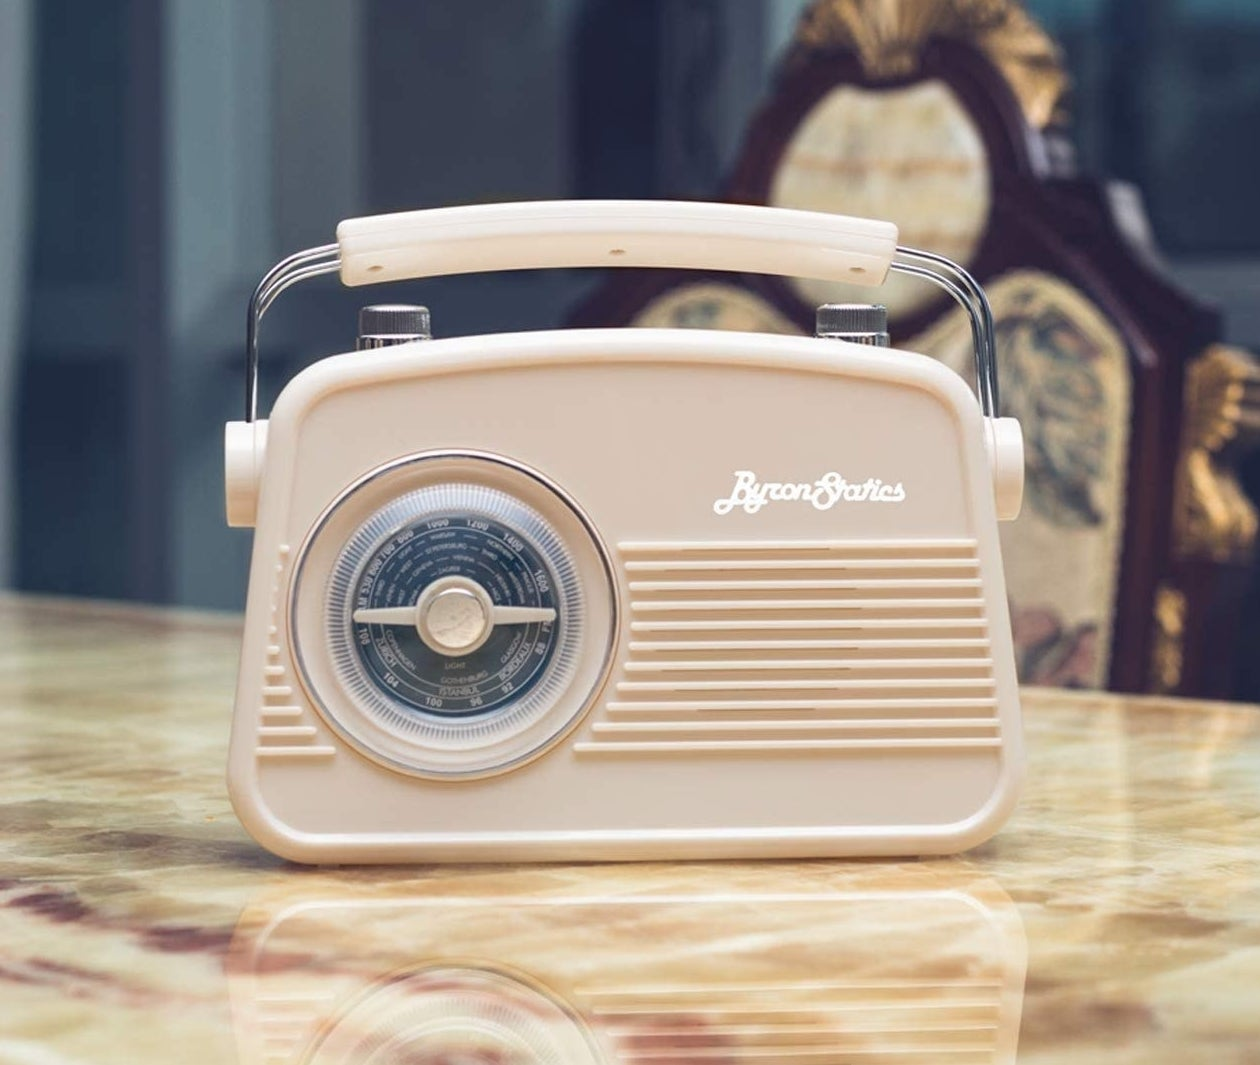 the almond colored radio